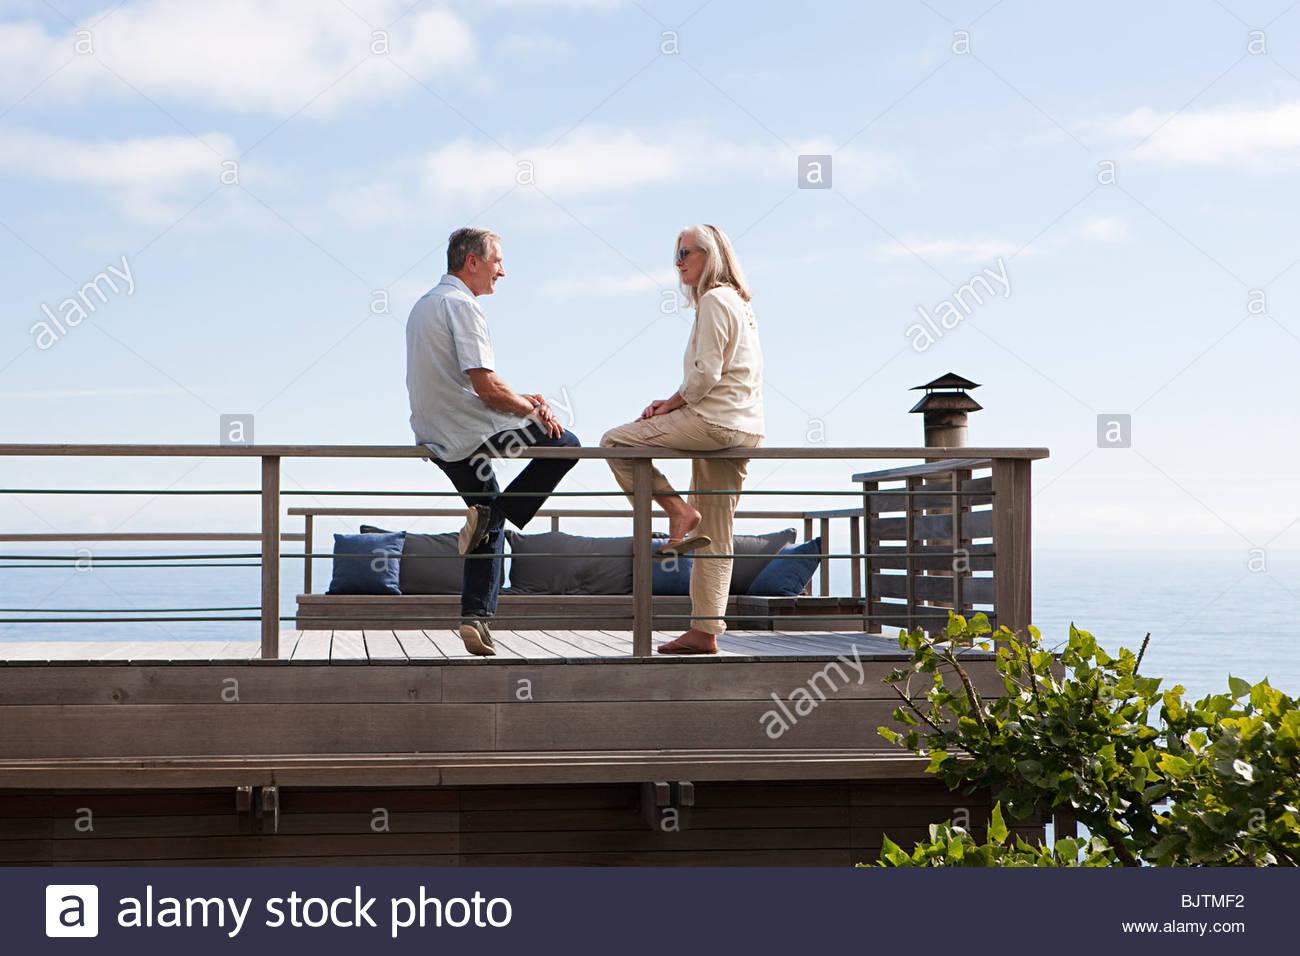 Paar auf Balkon am Meer Stockbild